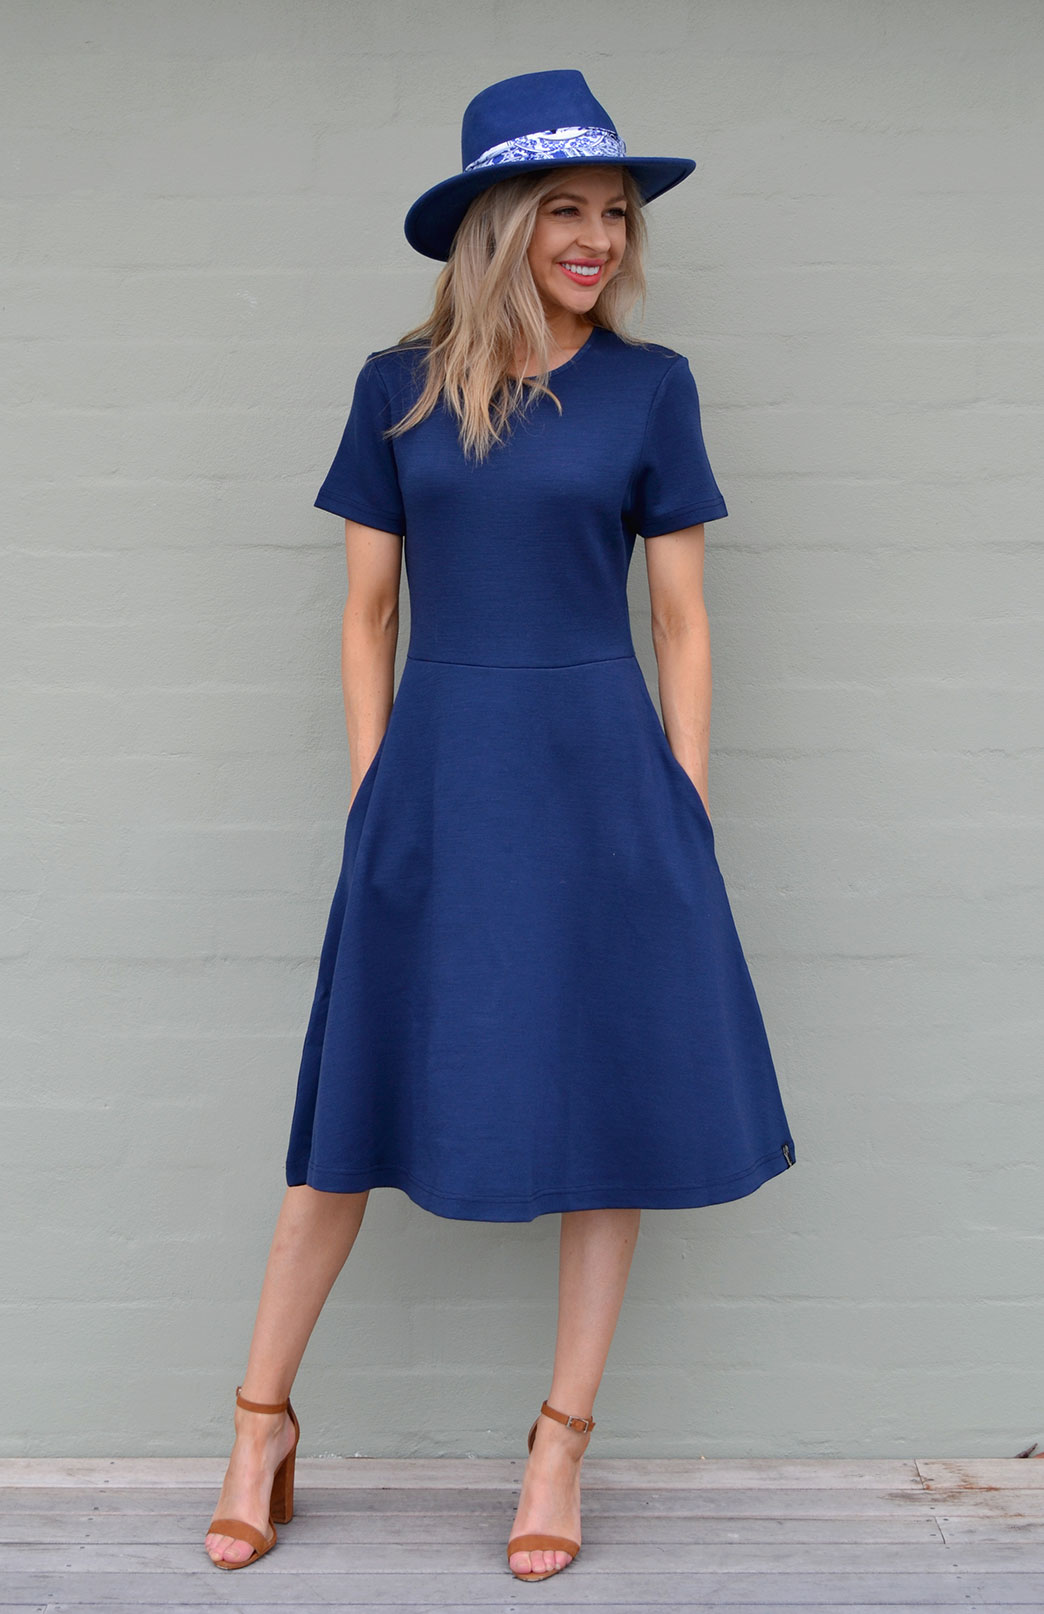 Zoe Dress - Women's Indigo Heavyweight Wool Short Sleeved Dress - Smitten Merino Tasmania Australia